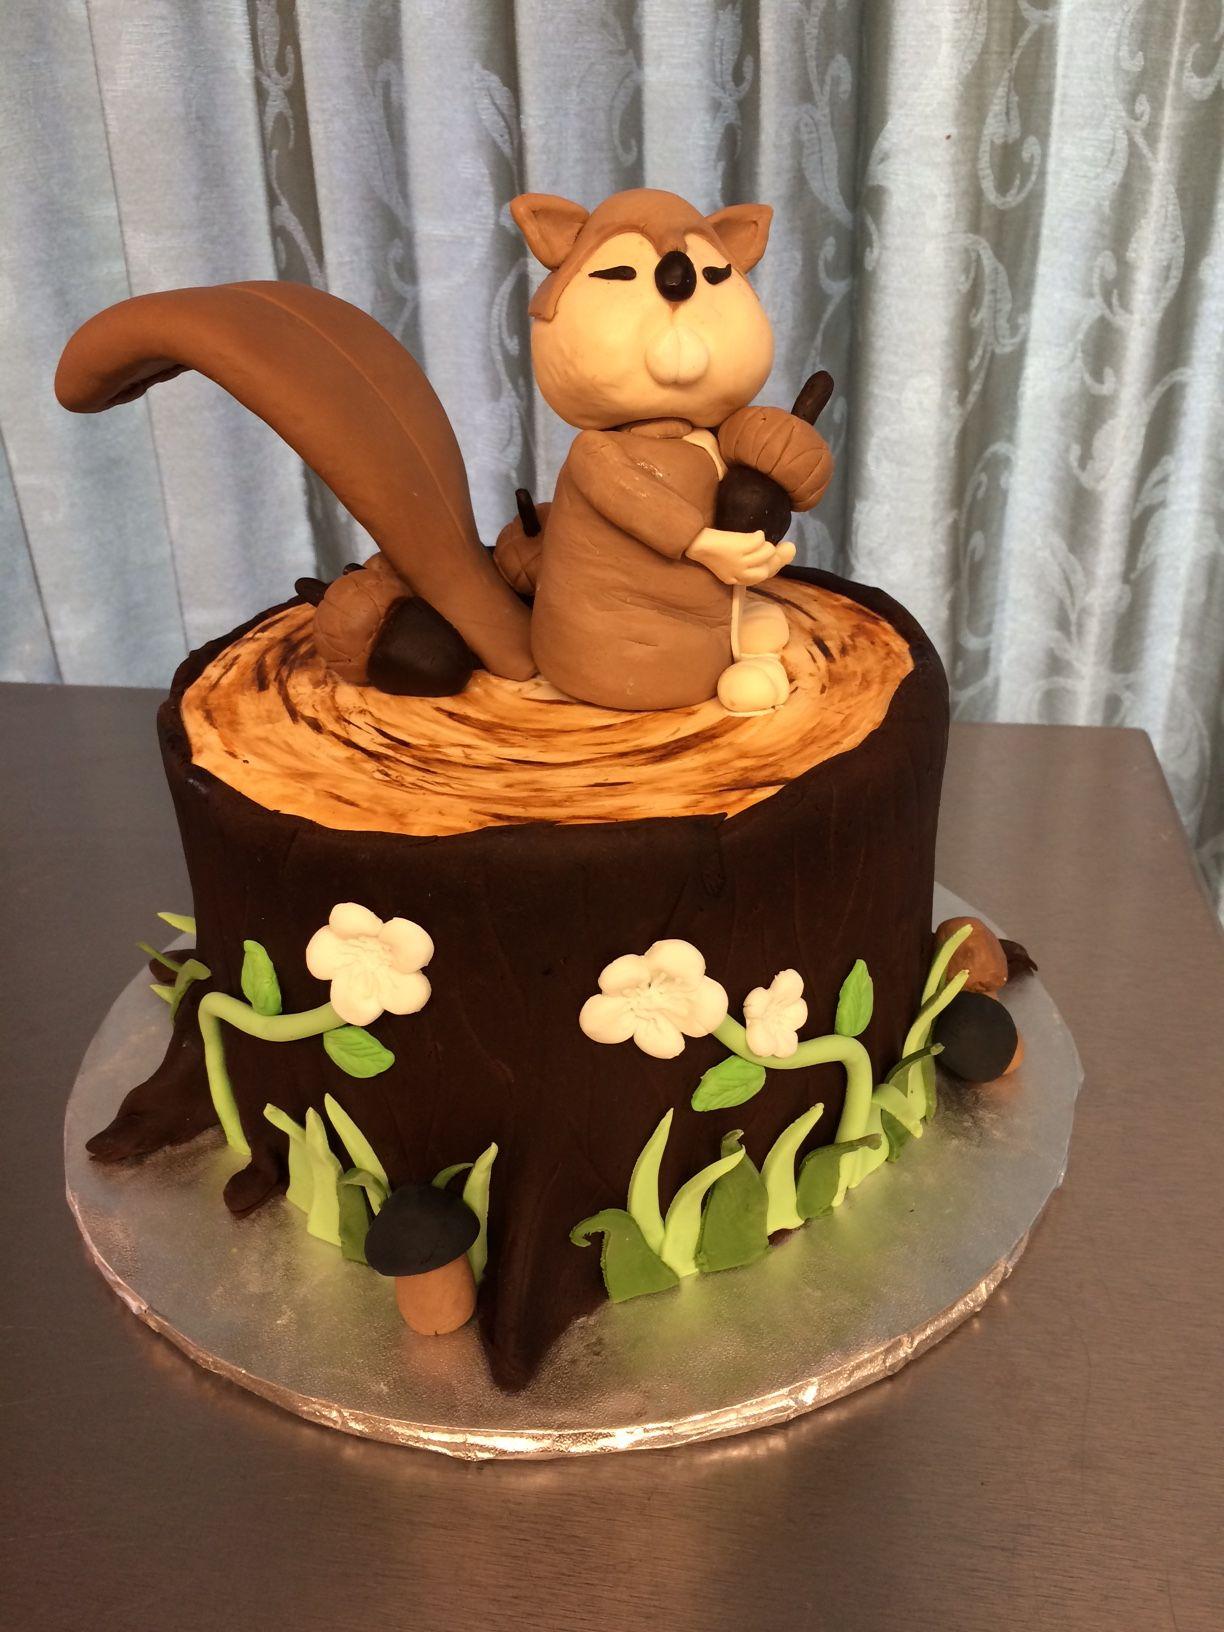 Enjoyable Squirrel Cake Squirrel Cake Kids Cake Cake Funny Birthday Cards Online Overcheapnameinfo